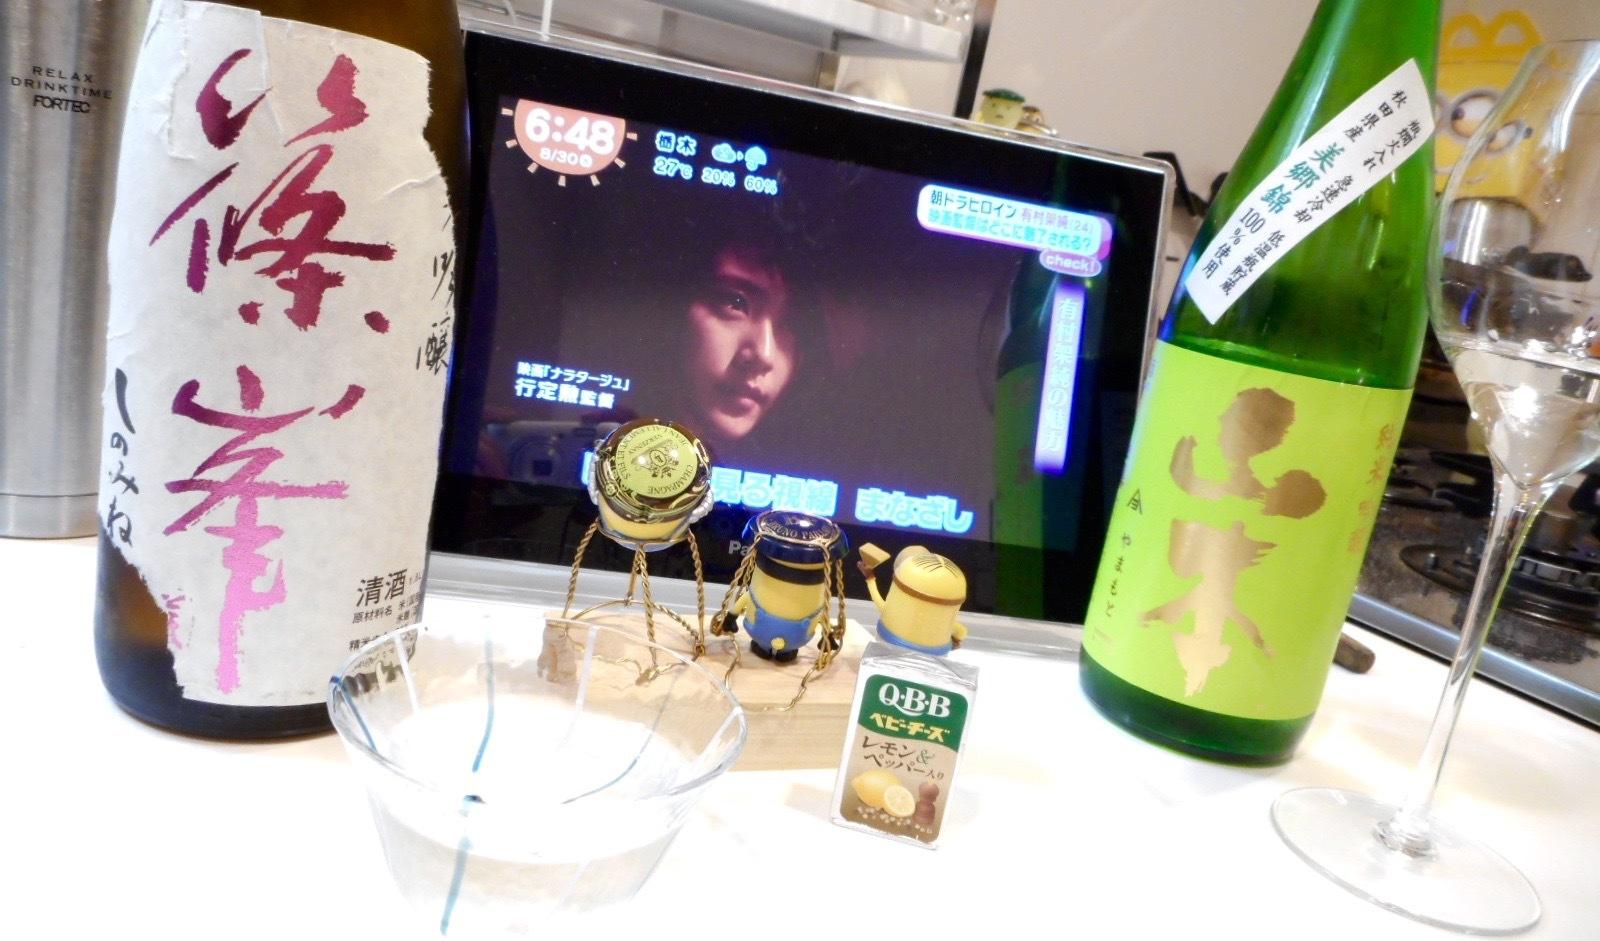 yamamoto_misatonishiki55_28by7.jpg